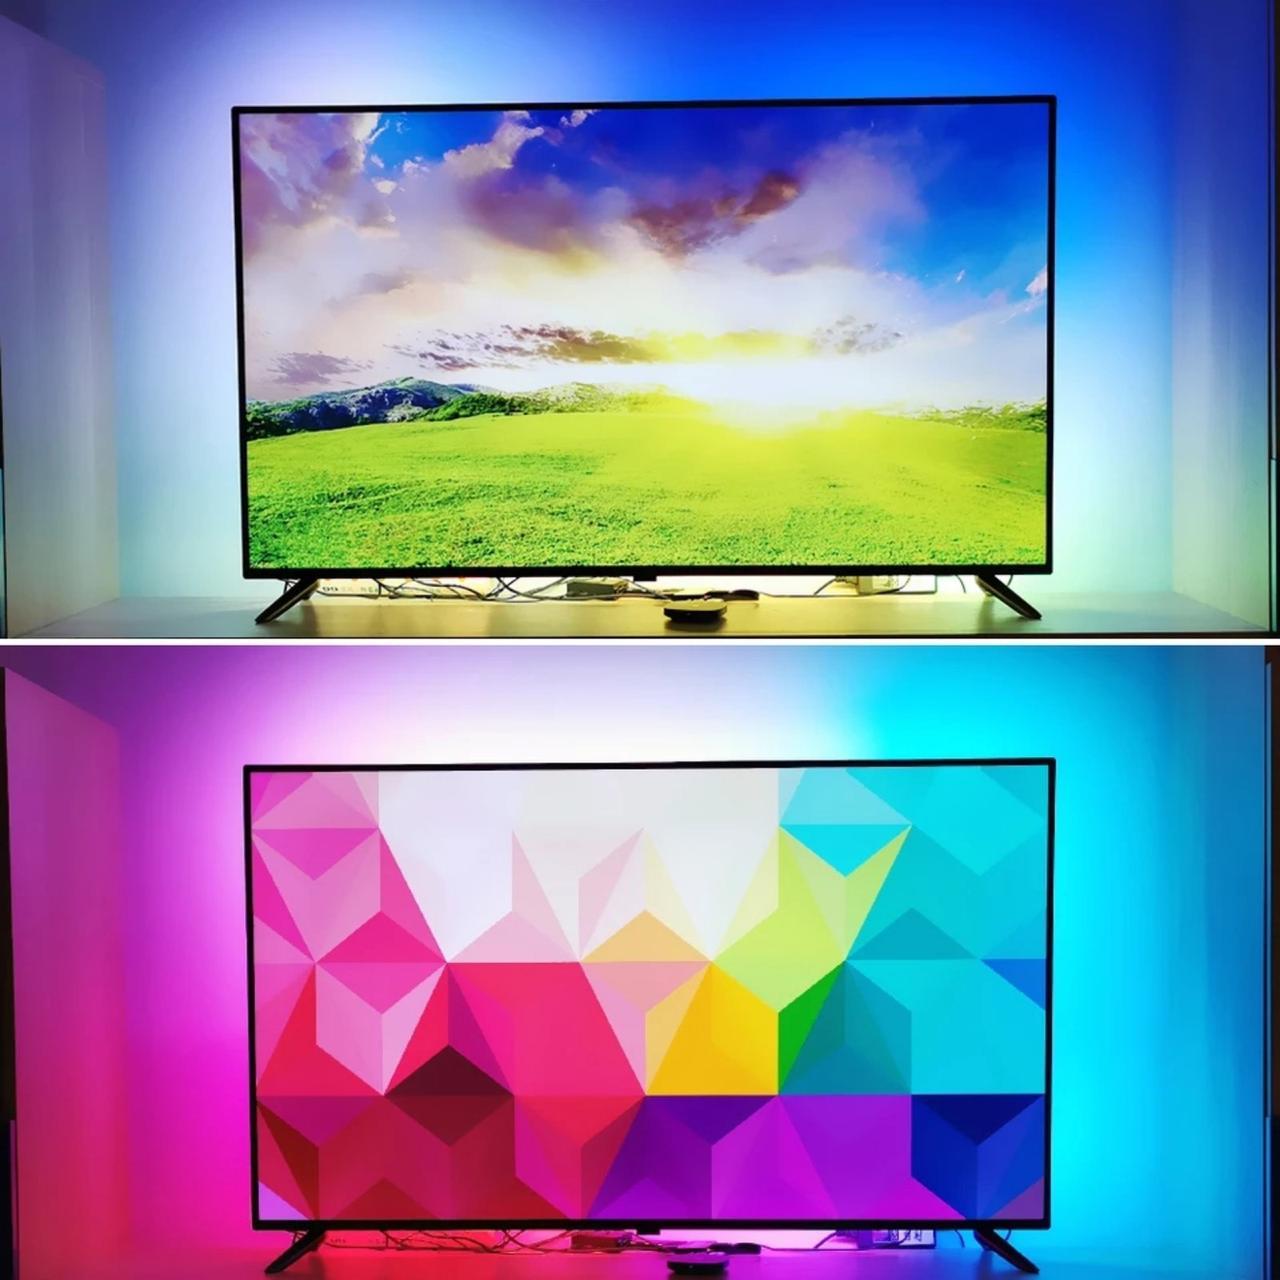 2 метра Интерактивная подсветка на 30светодиодов/м Ambilight для Android-TV и ПК